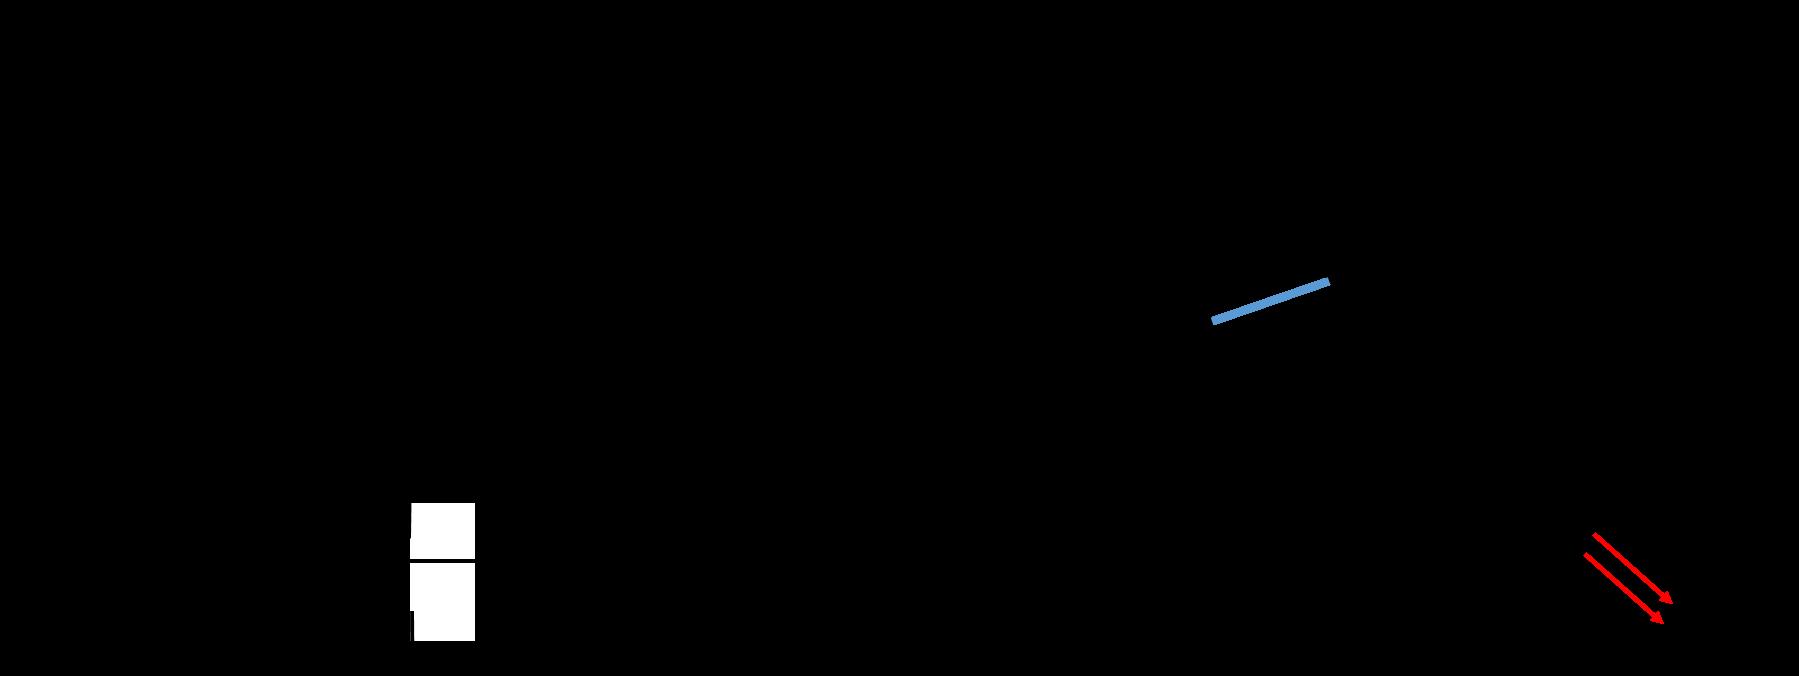 Wiring A Diode Bridge